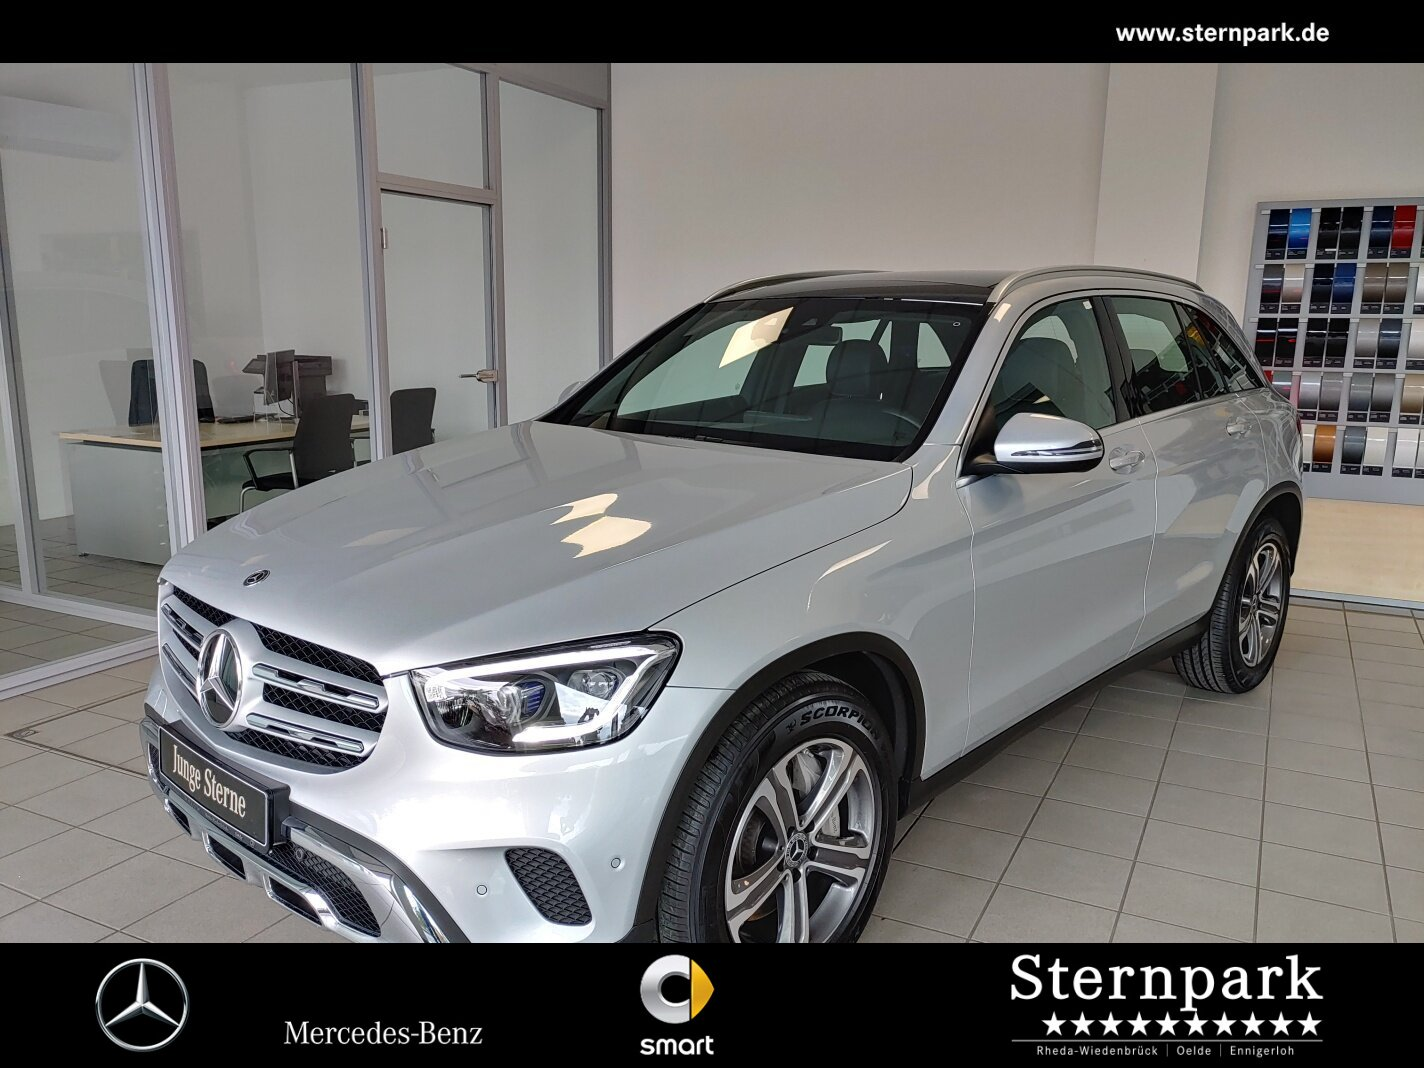 Mercedes-Benz GLC 400 d 4M R6-Zyl +AHK+Pano+Akustikglas+MultiB, Jahr 2020, Diesel